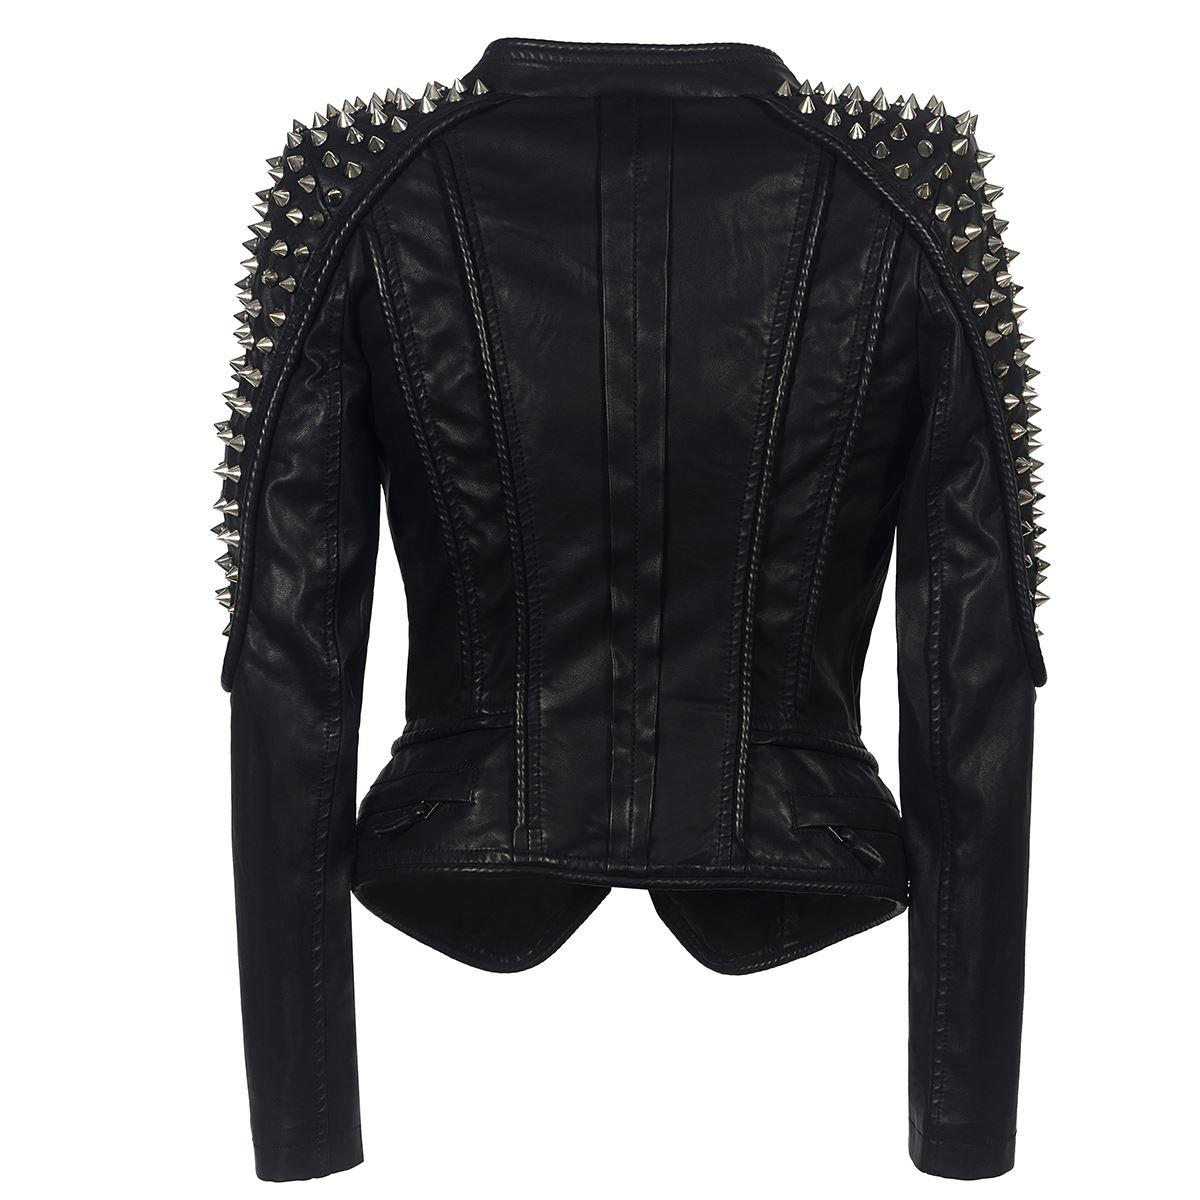 Punk Rivet faux leather PU Jacket Women fashion rose Winter AutumnMotorcycle Jacket Black faux leather Coat Outerwear Punk